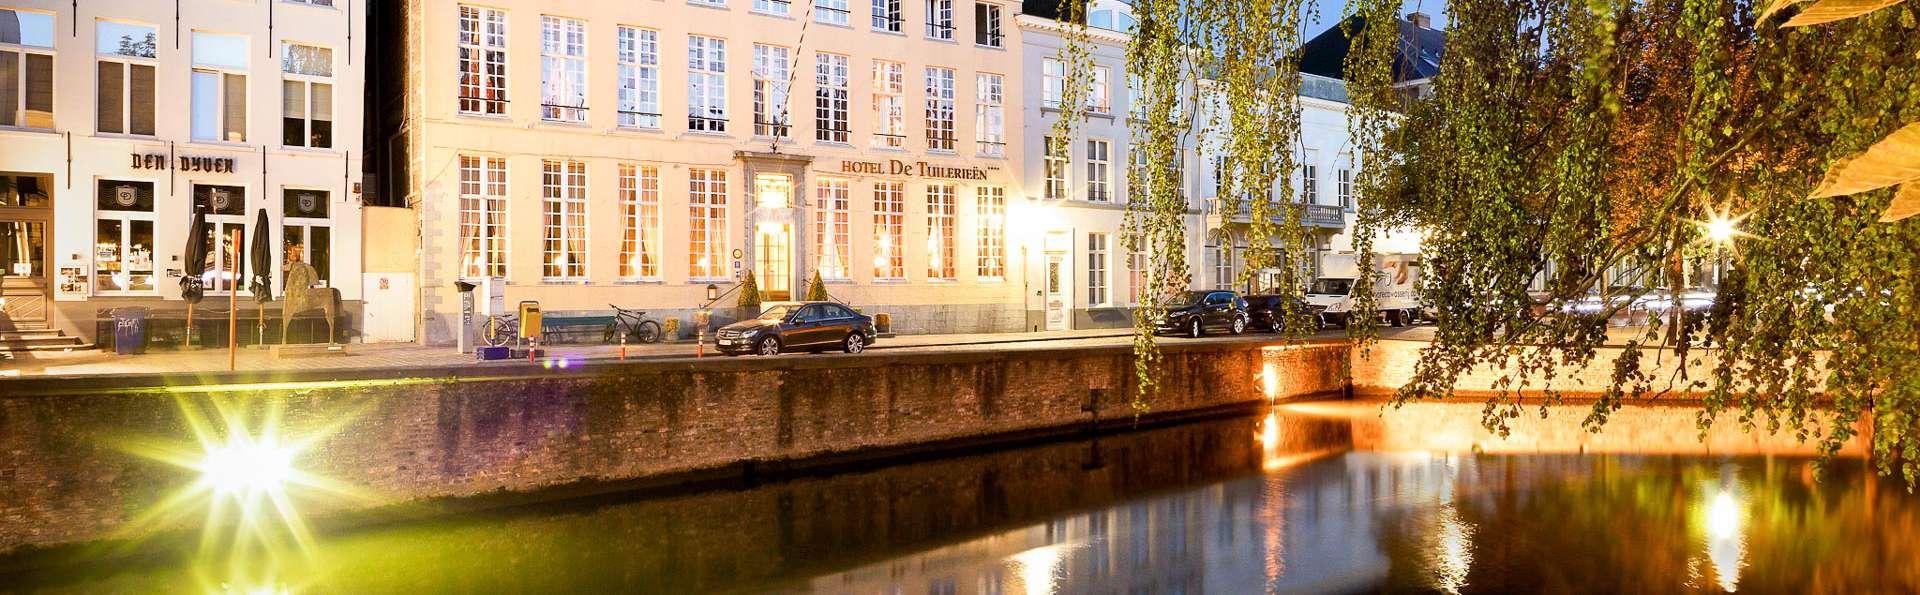 Hotel de Tuilerieen - EDIT_N2_FRONT_04.jpg